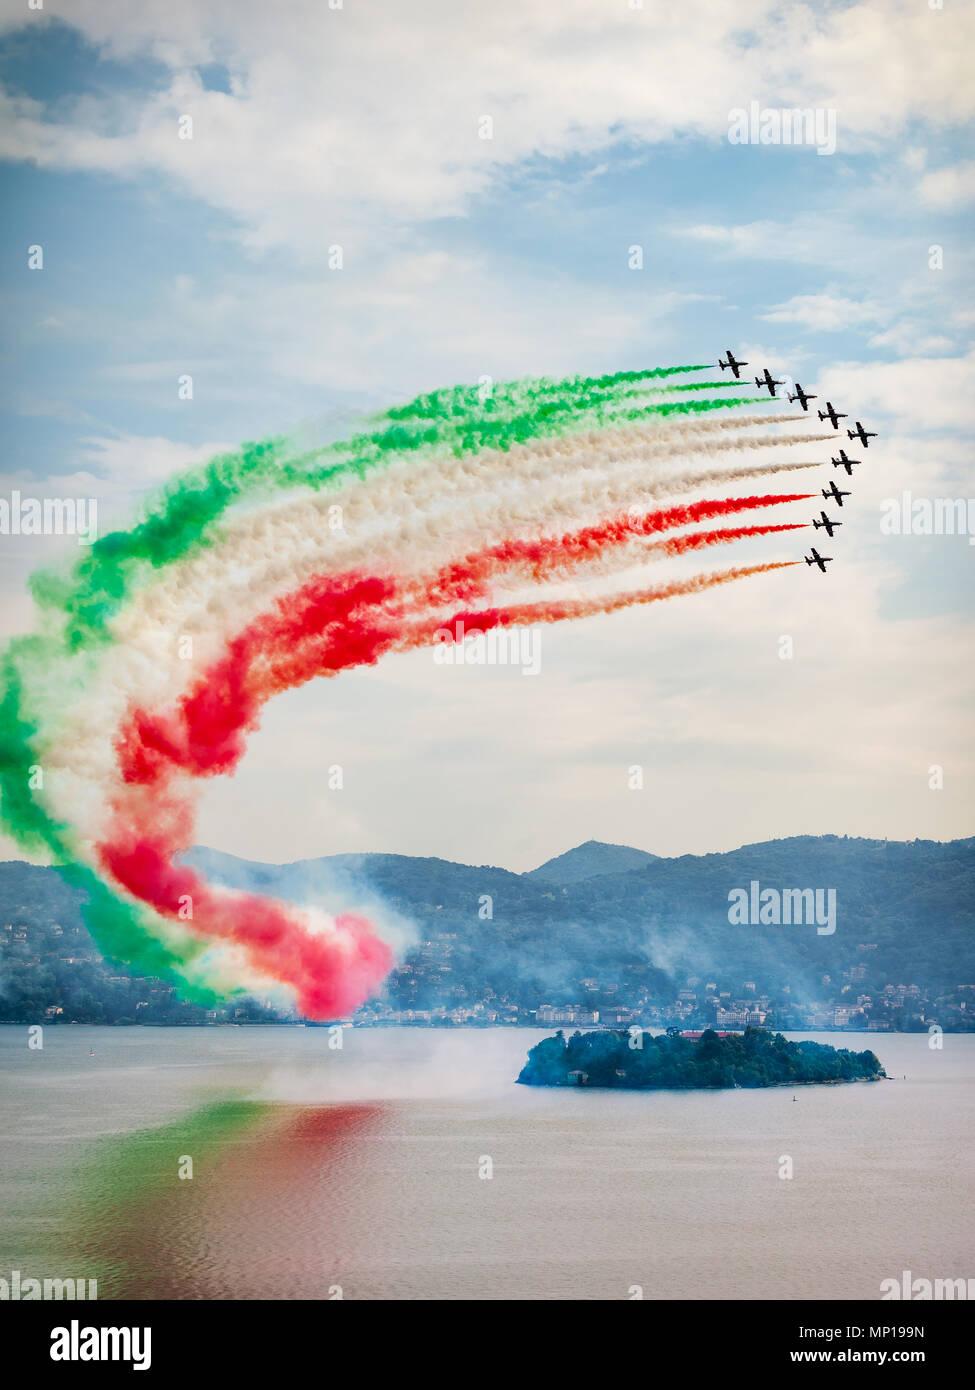 The Italian Aerobatic Display Team the Frecce Tricolori formation flying over the Lake Maggiore, Verbania, Italy Stock Photo